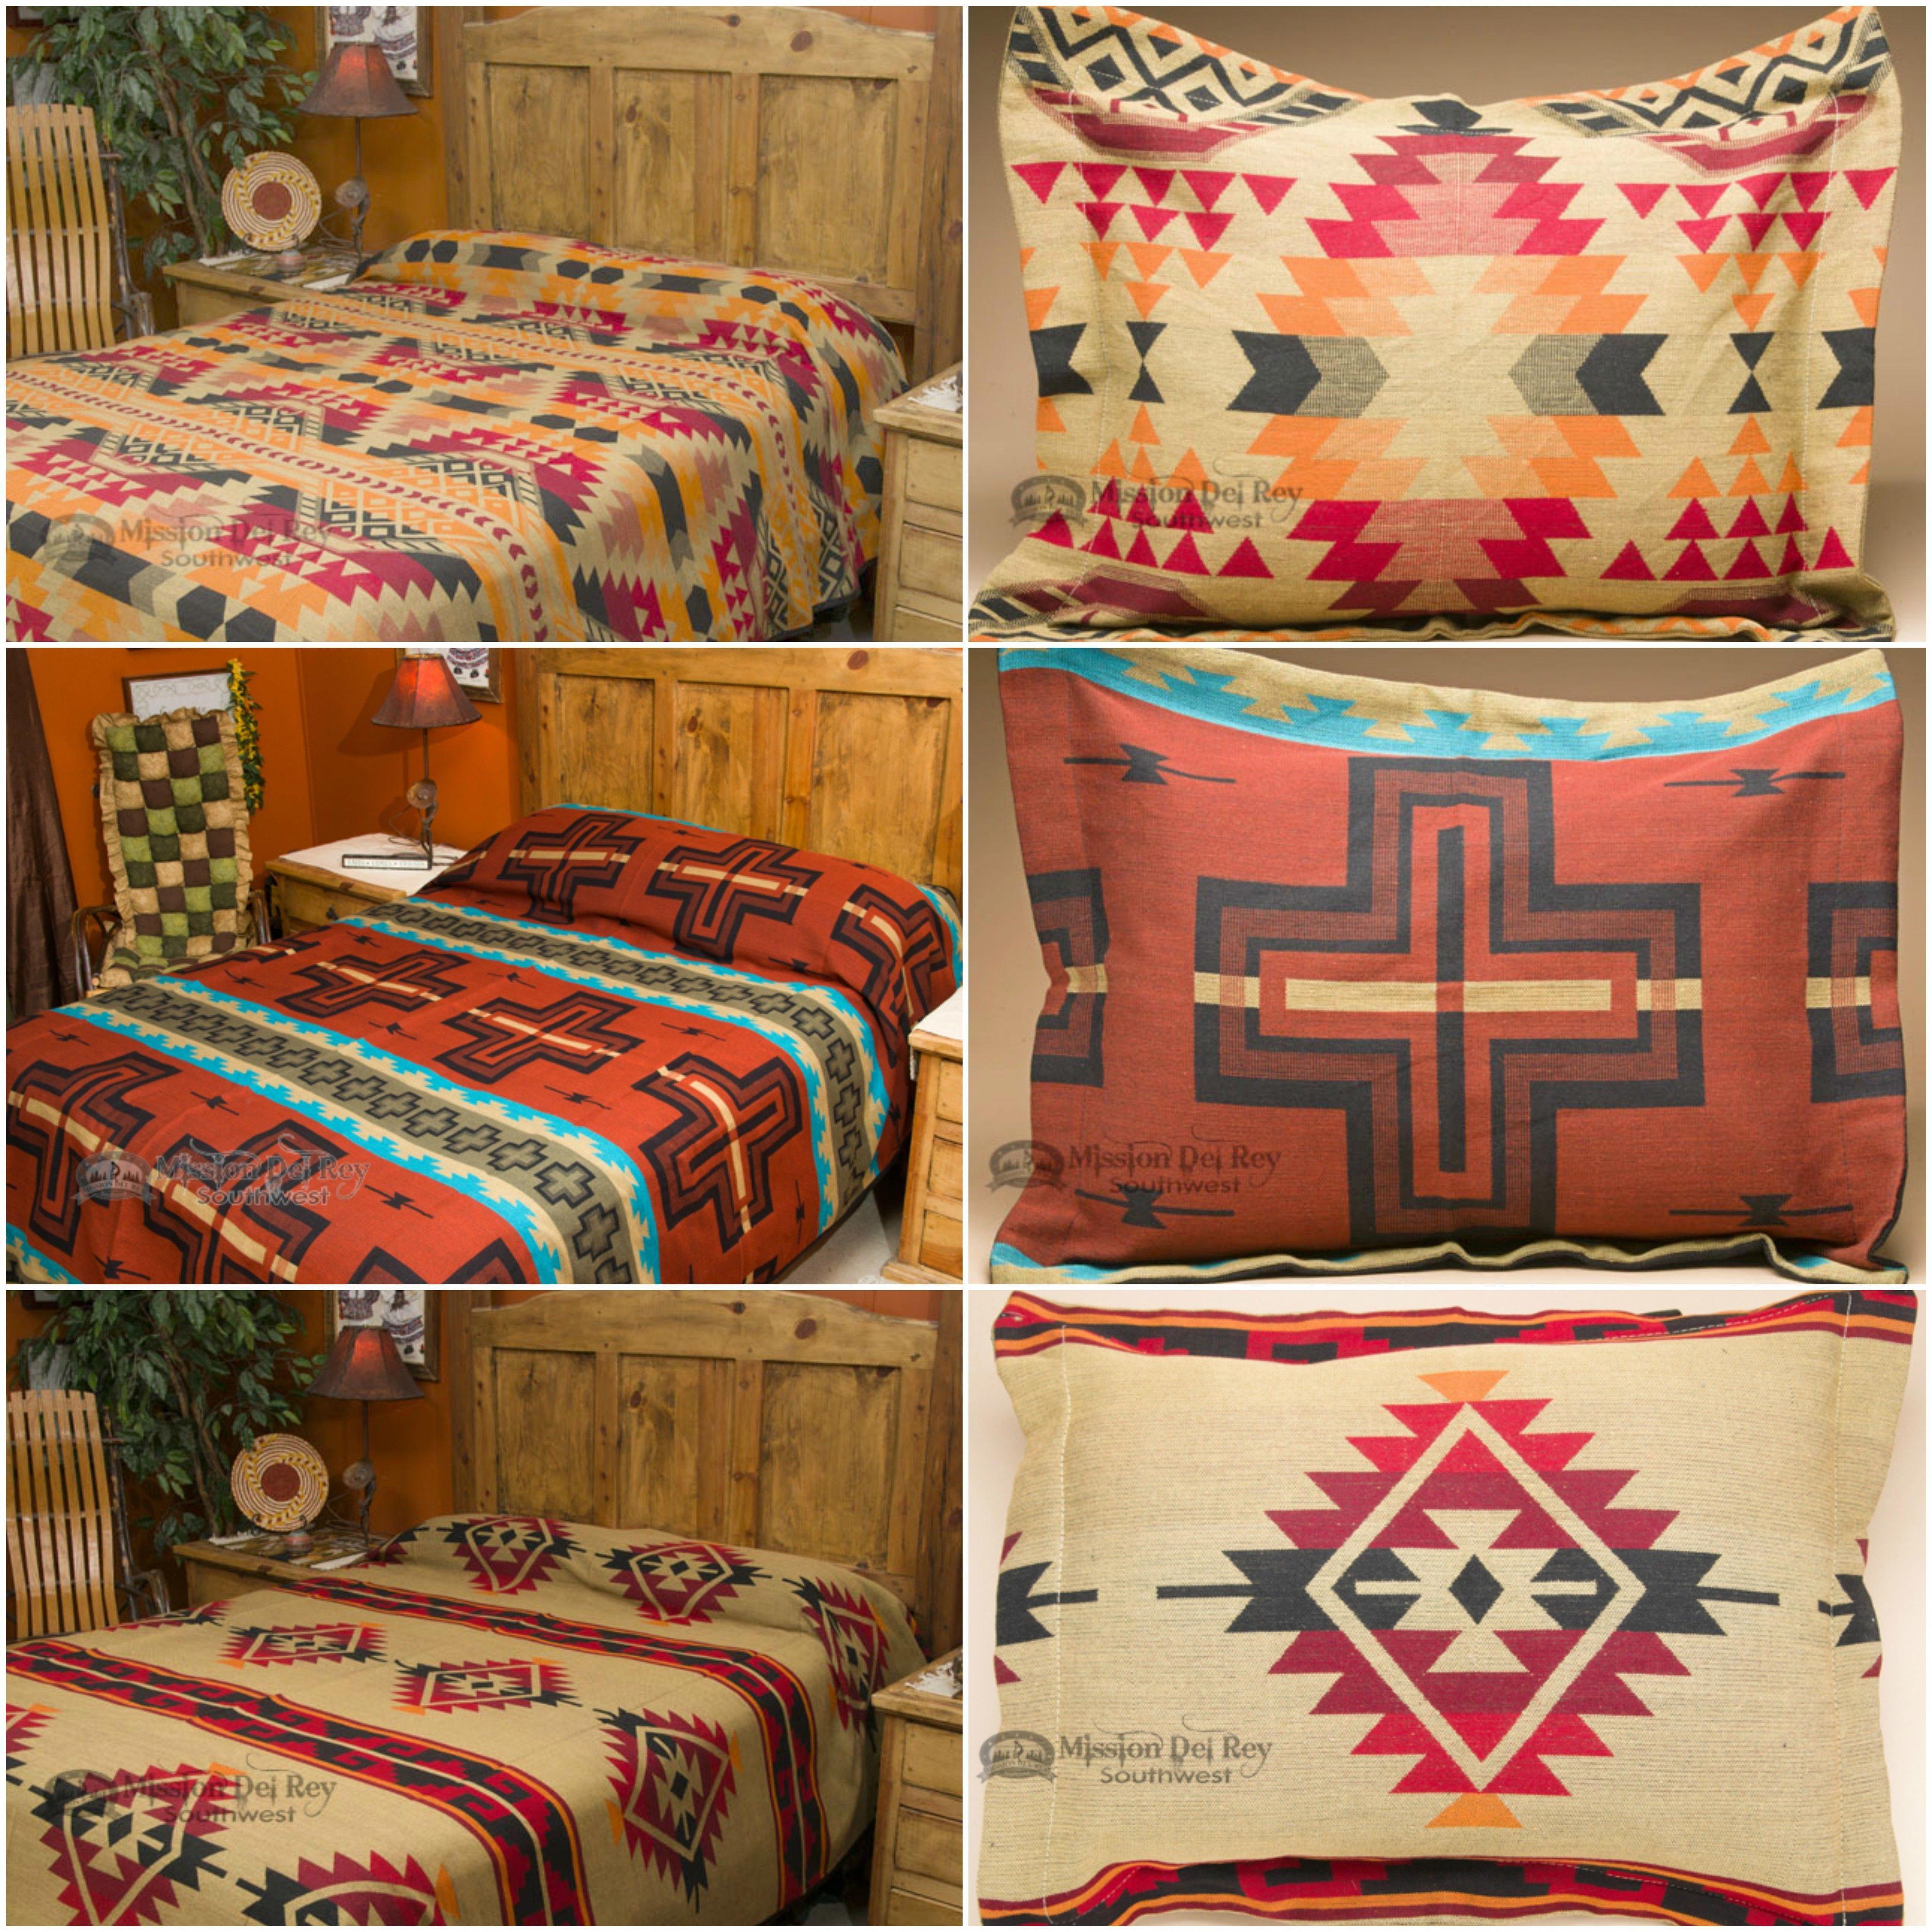 Bed sheets queen size walmart magnificentbeddingideas